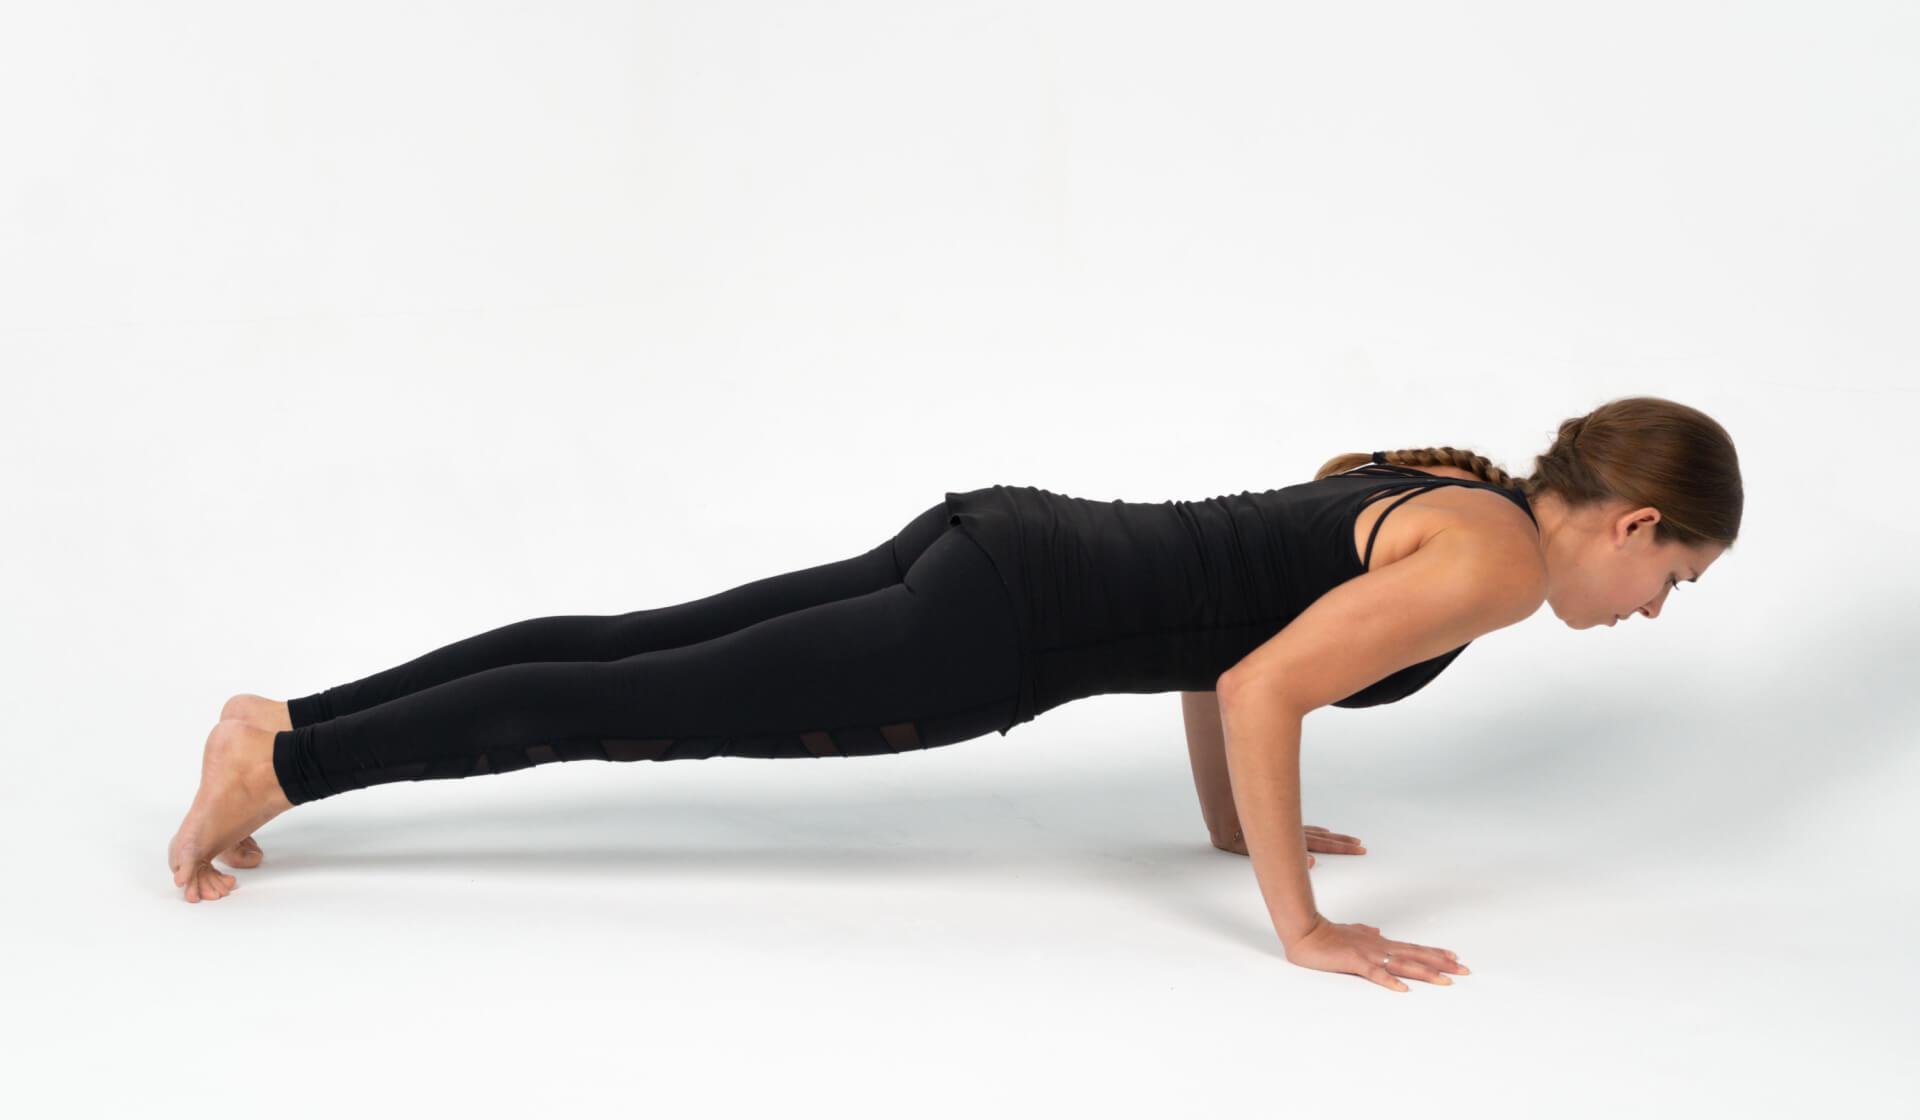 Woman yoga teacher dressed in all black practicing a yoga pose (chaturanga dandasana or yogic push-up) against a white backdrop